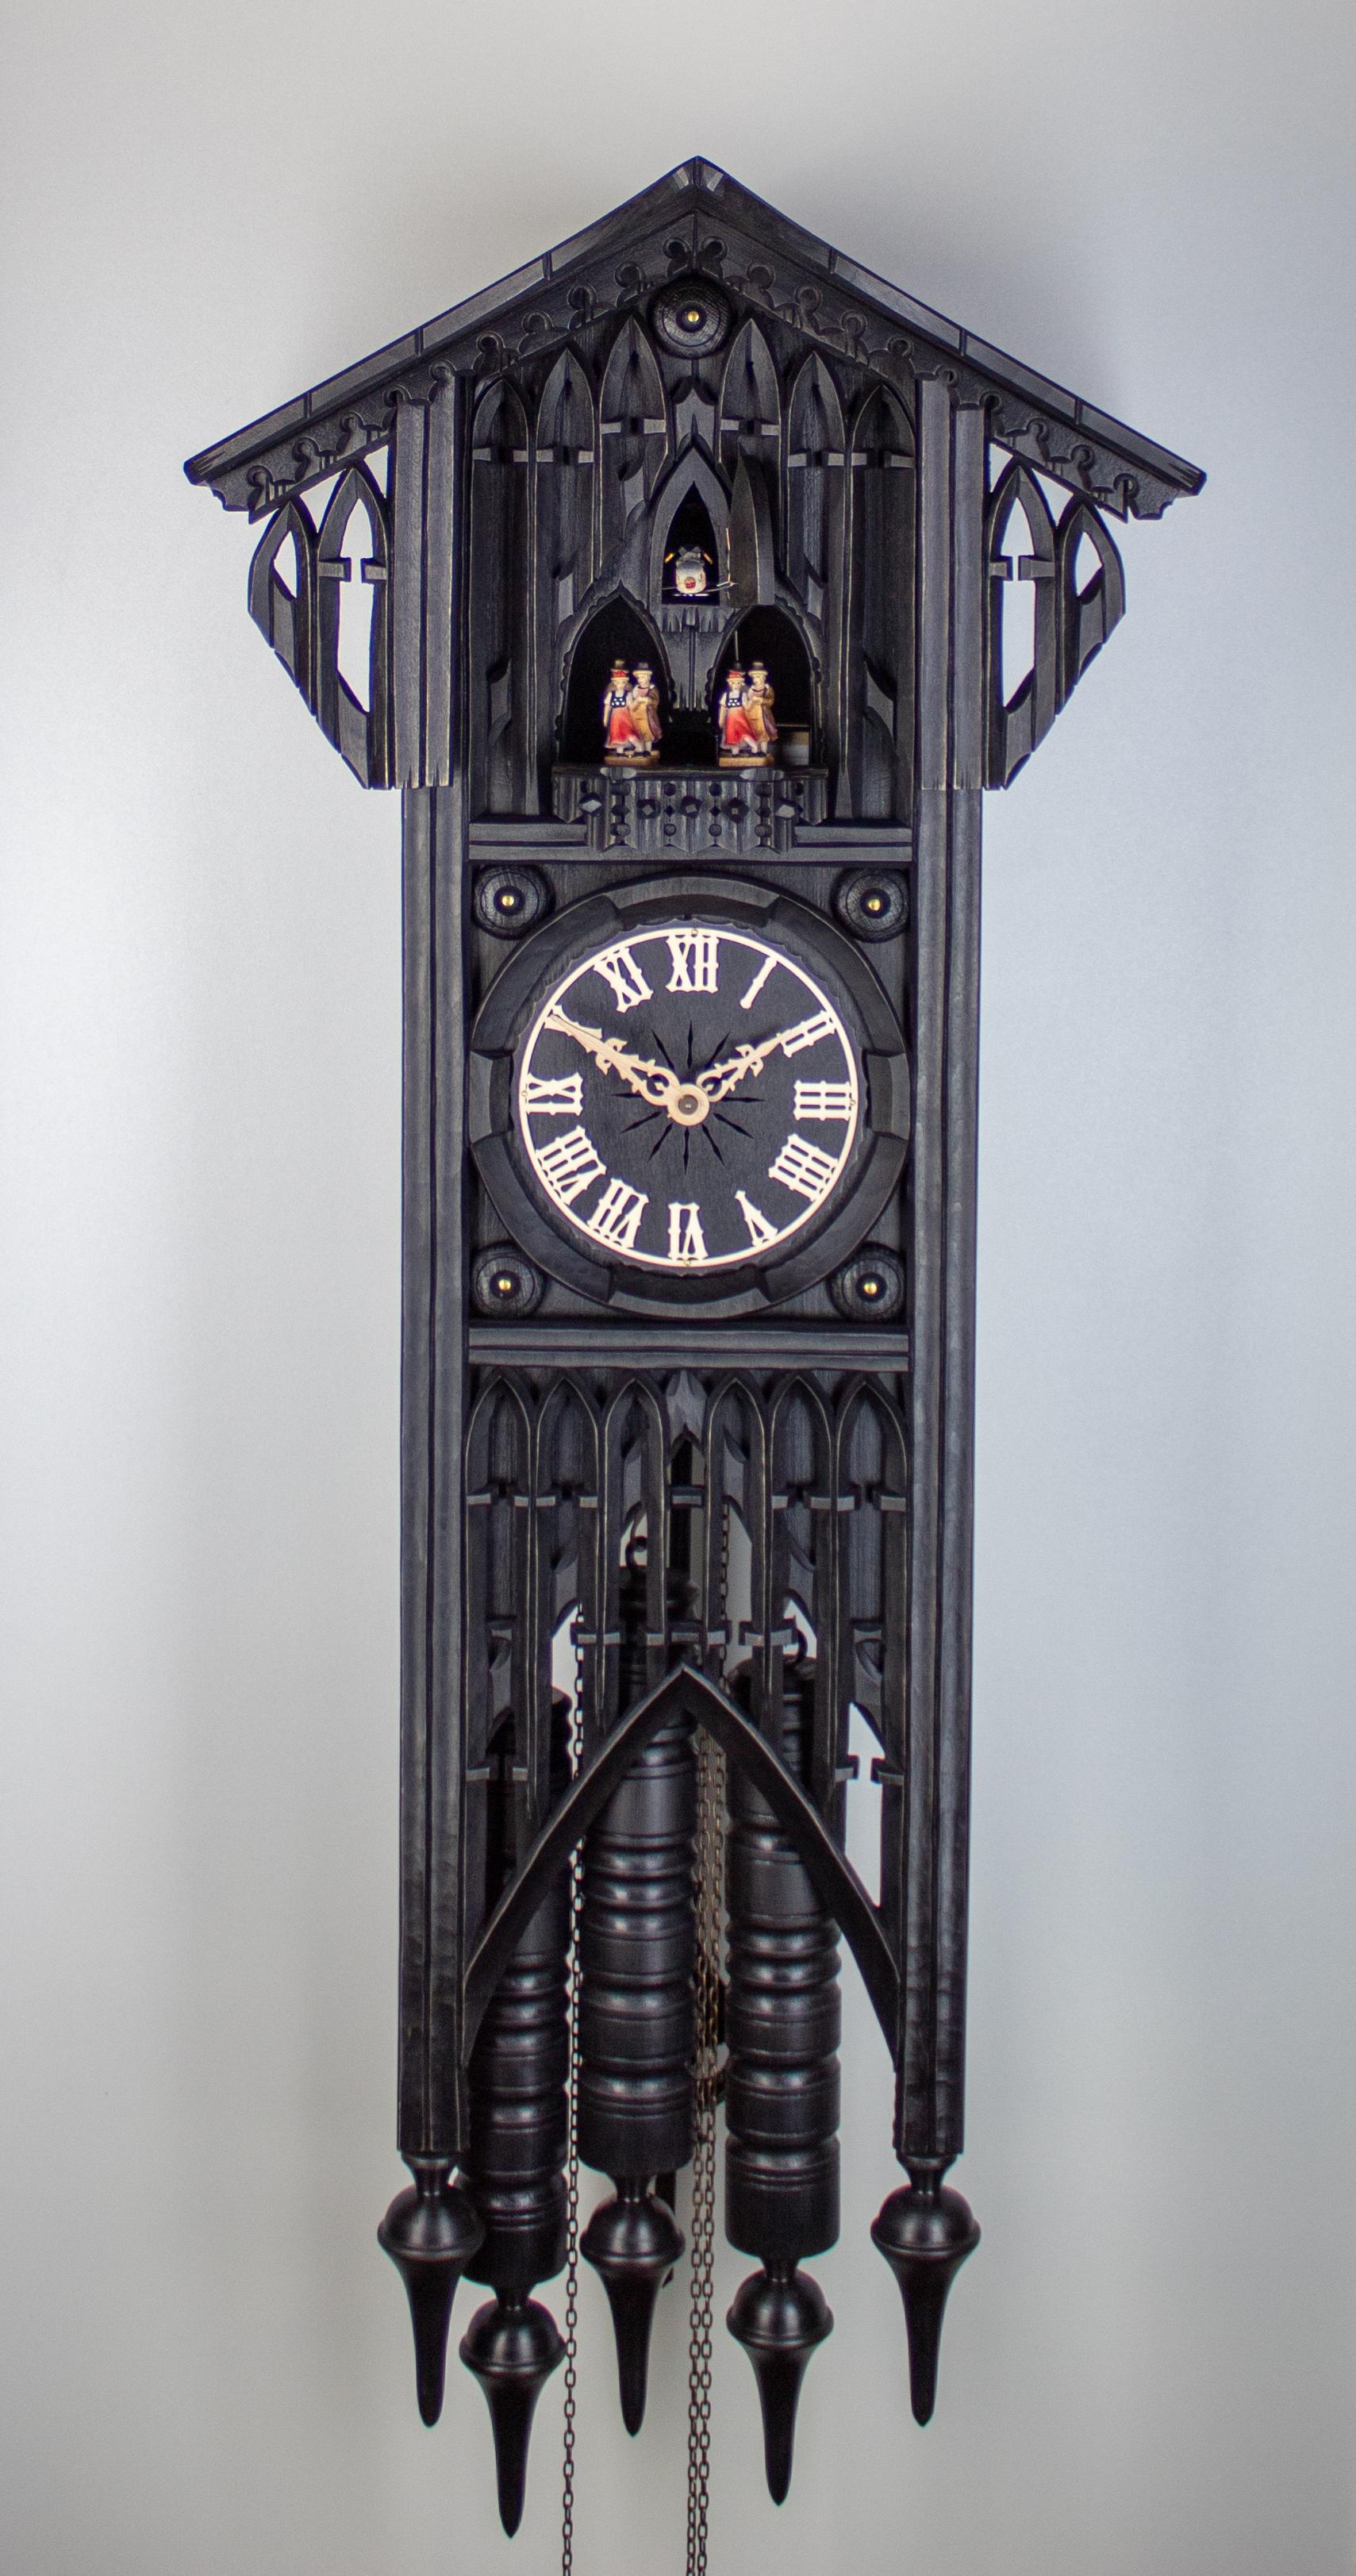 8 Days Music Dancer Cuckoo Clock Gothic Style